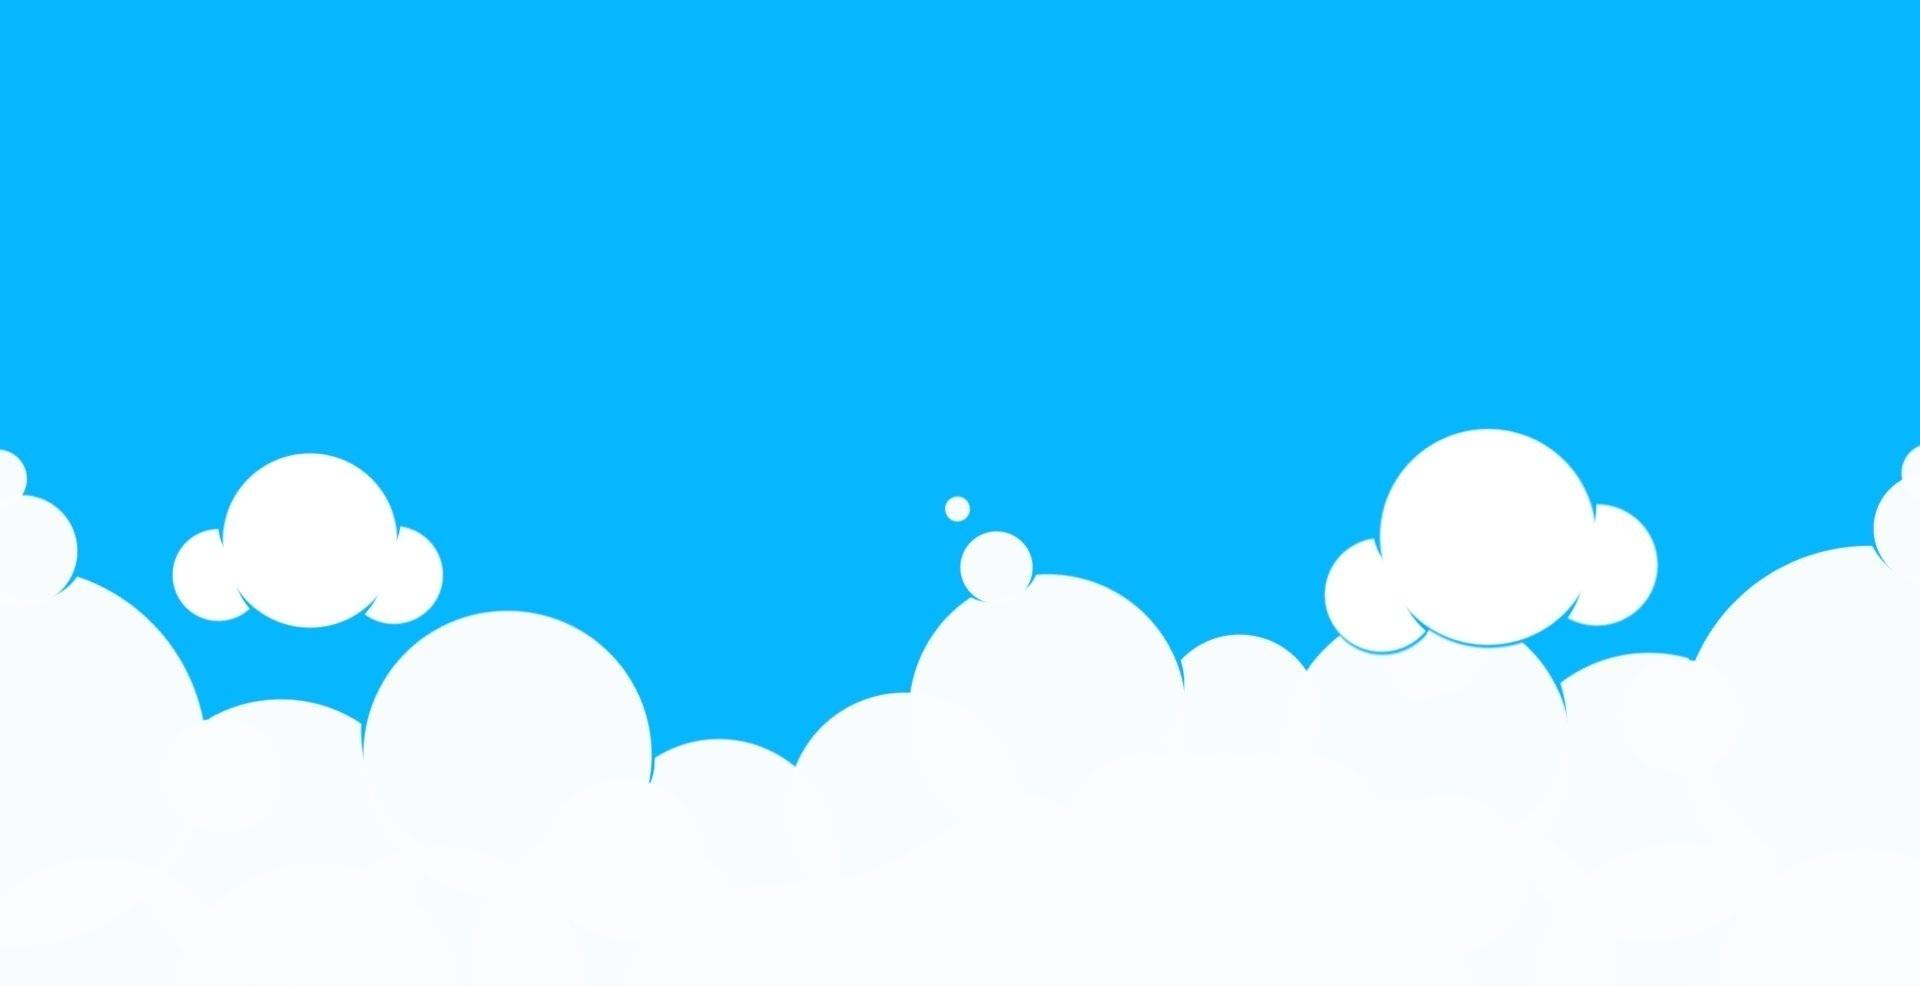 Clouds clipart sky blue Background Blue schliferaward grass Clipart